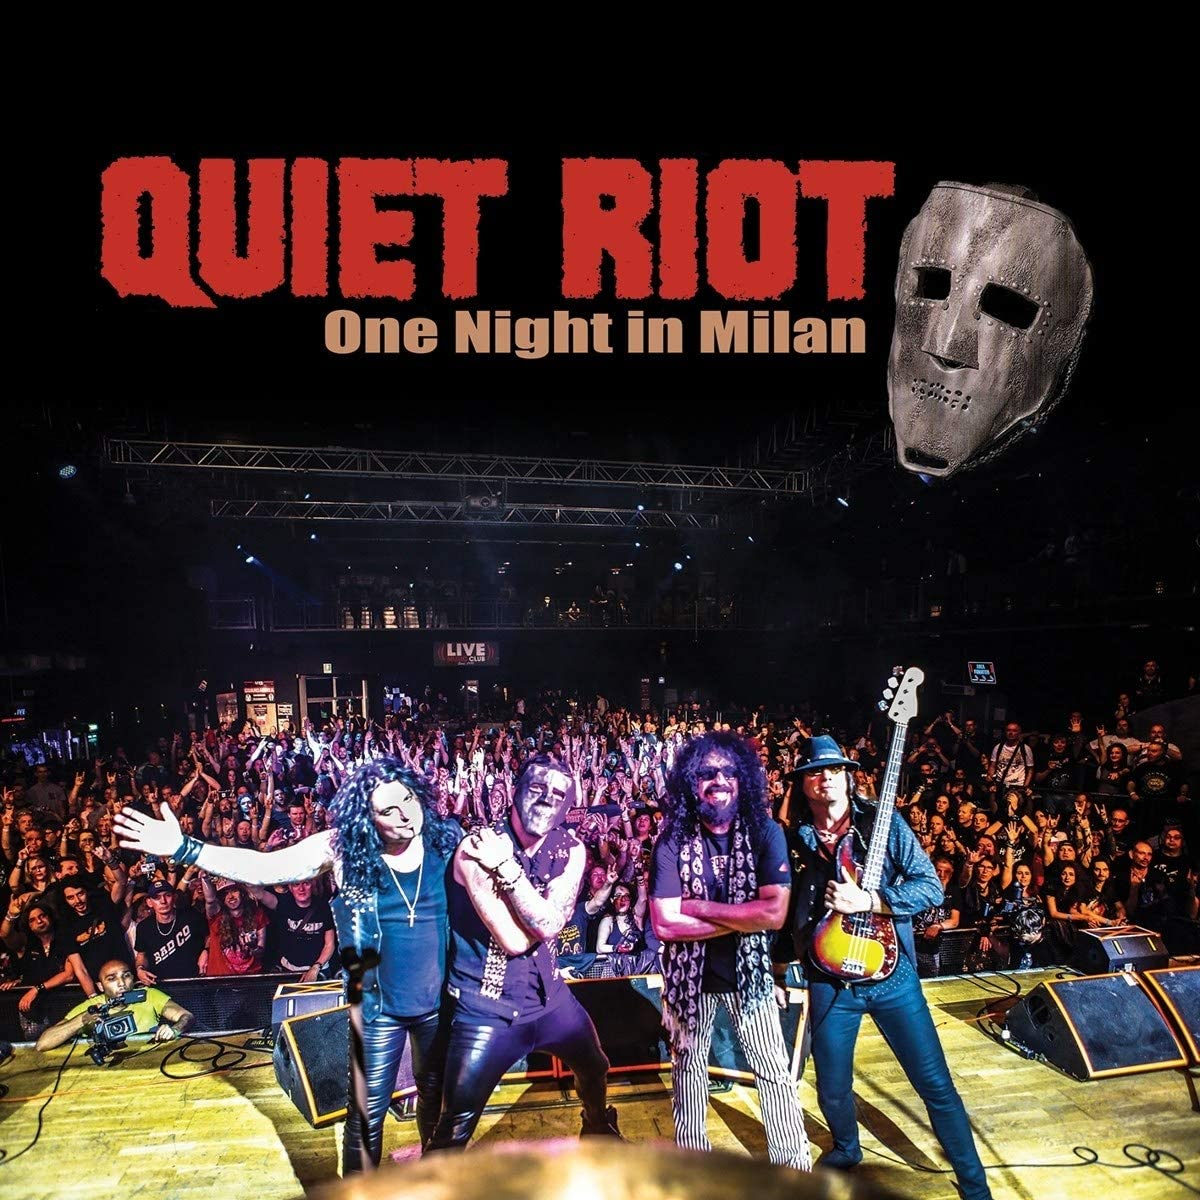 One Night In Milan : QUIET RIOT: Amazon.com.br: DVD e Blu-ray